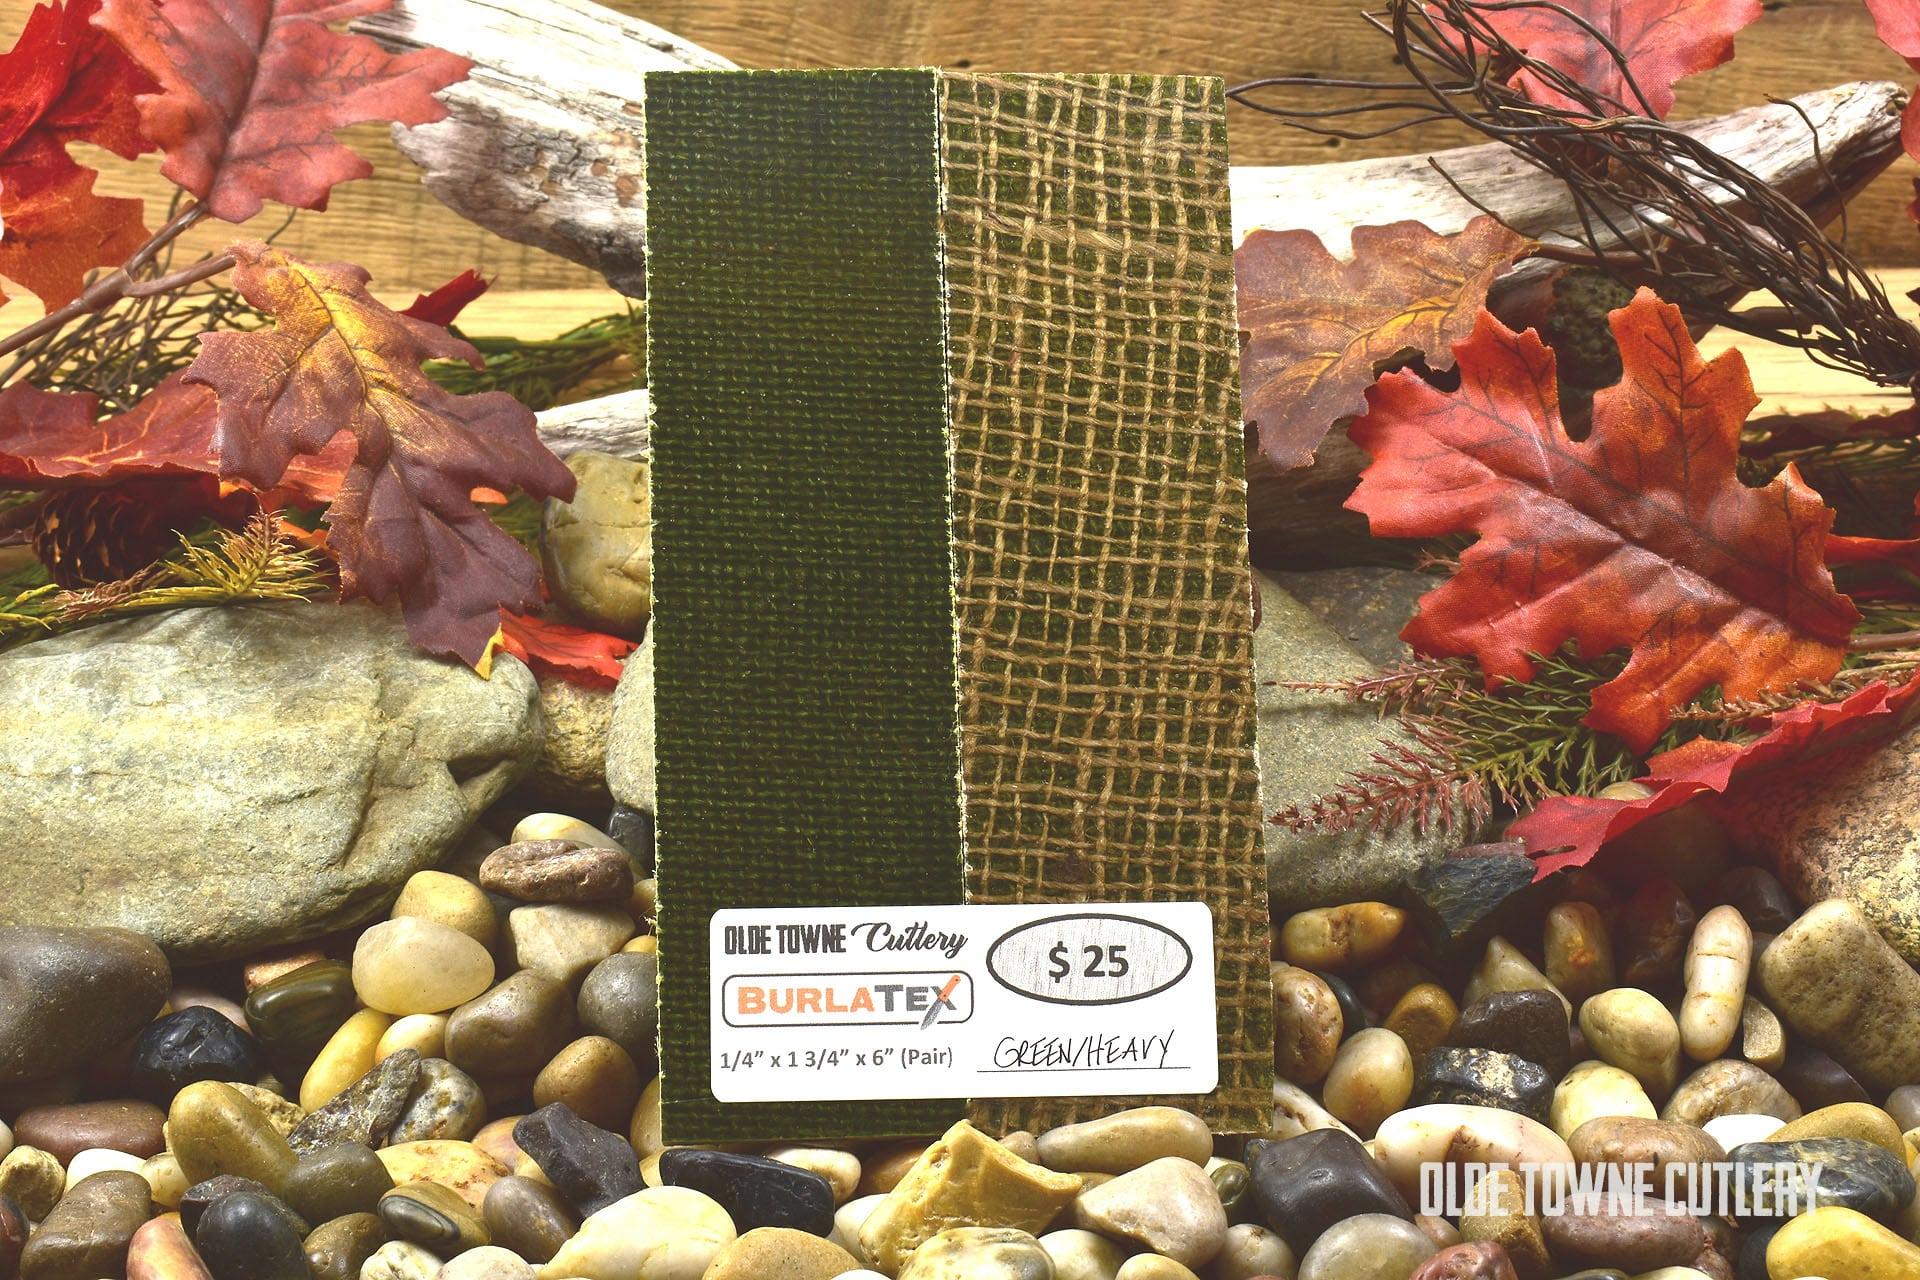 Burlatex GRNHVYSCL Green/Heavy 1/4 x 1 3/4 x 6